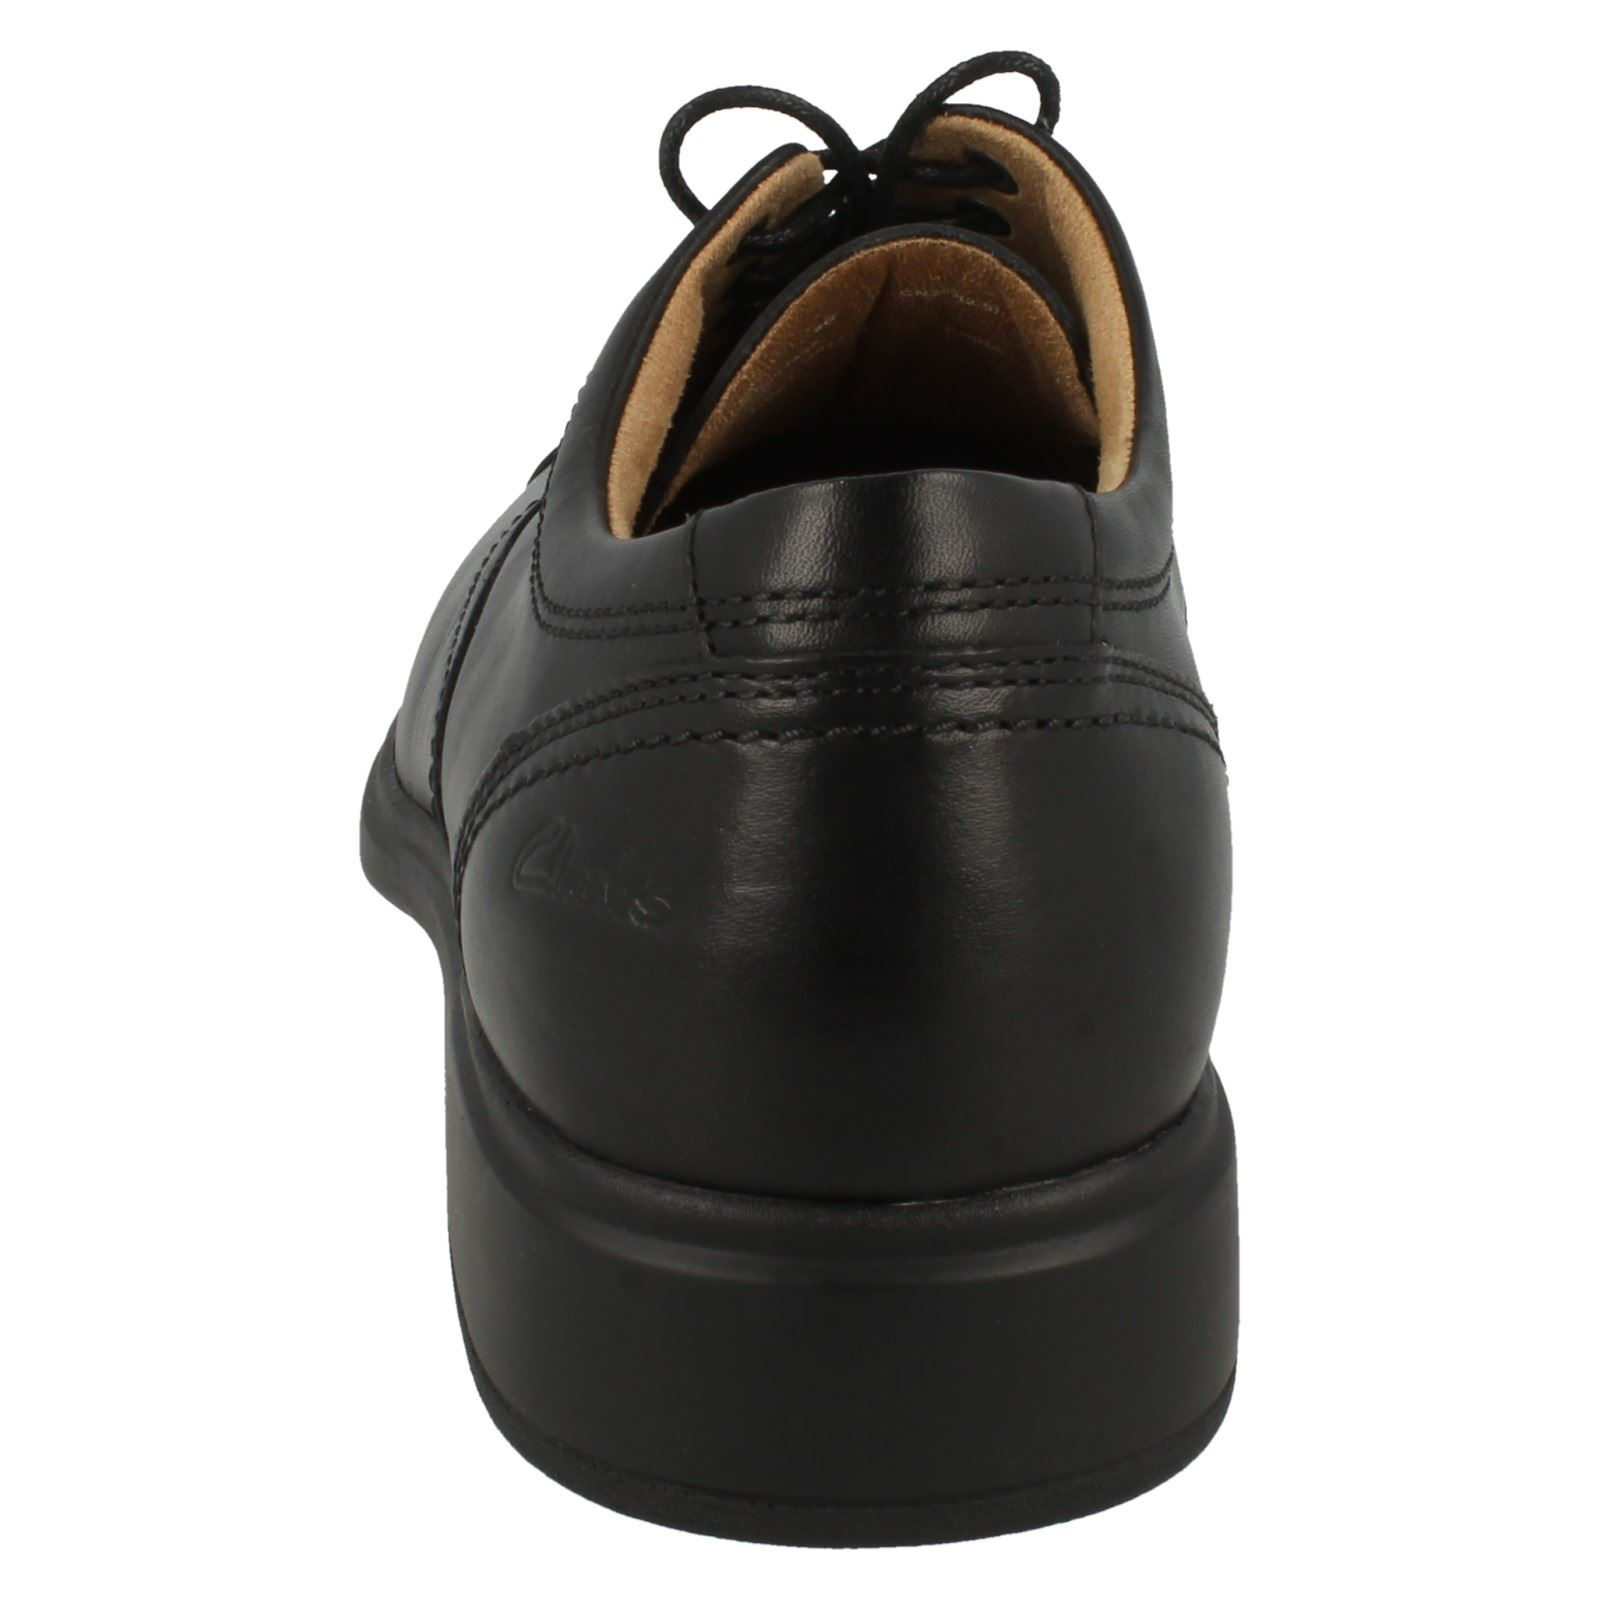 Mens Clarks Formal Light' Lace Up Shoes 'Glevo Light' Formal 625b61